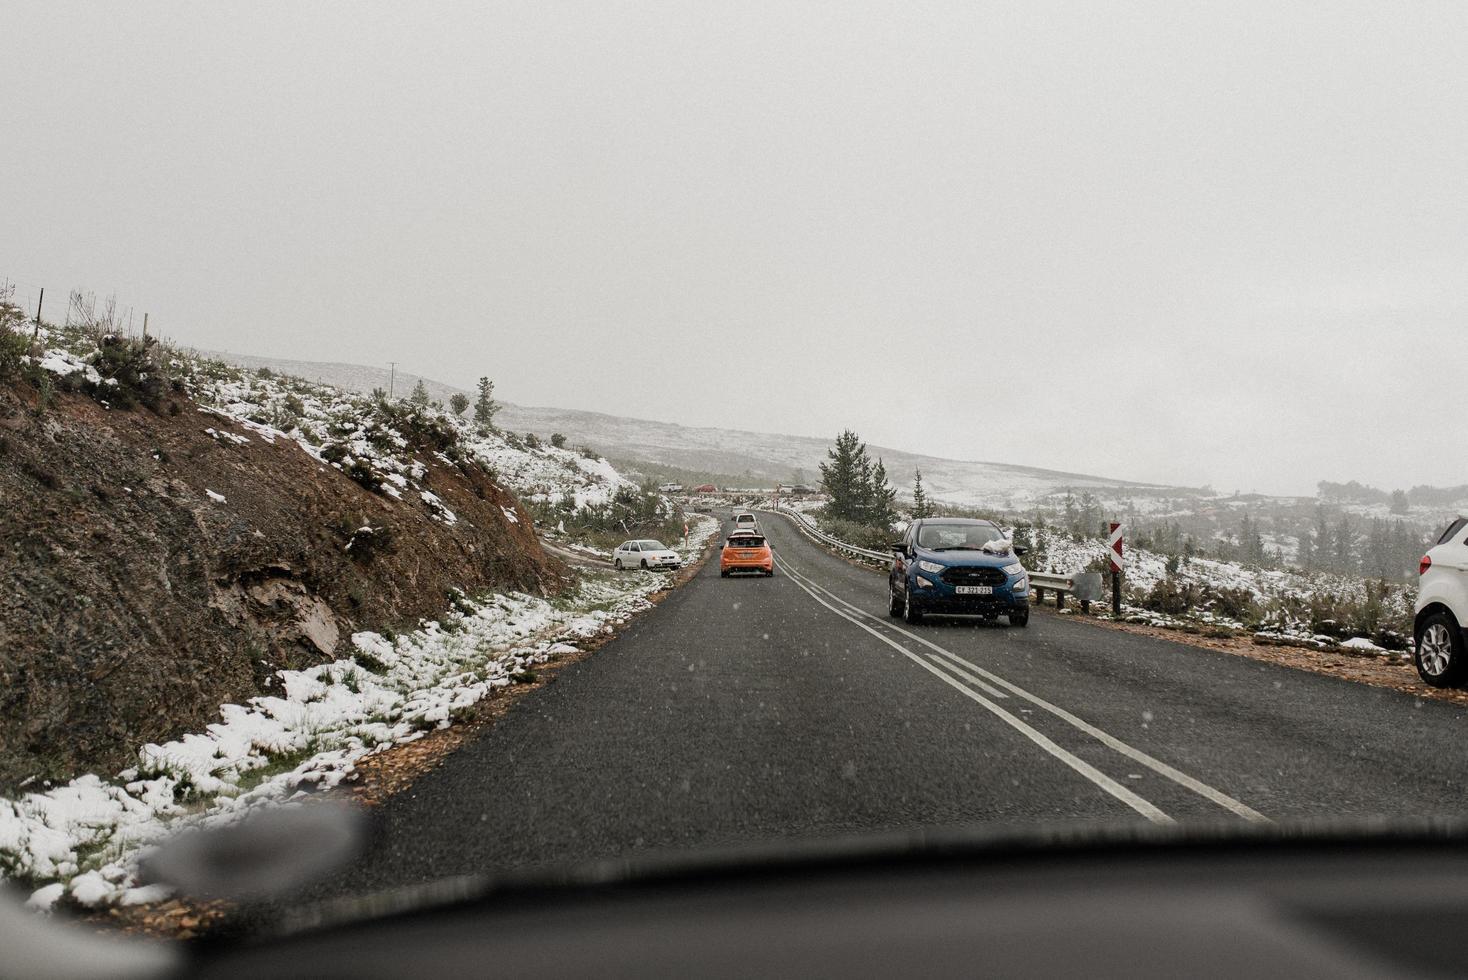 Kaapstad, Zuid-Afrika, 2020 - Auto's op snelweg terwijl sneeuw valt foto